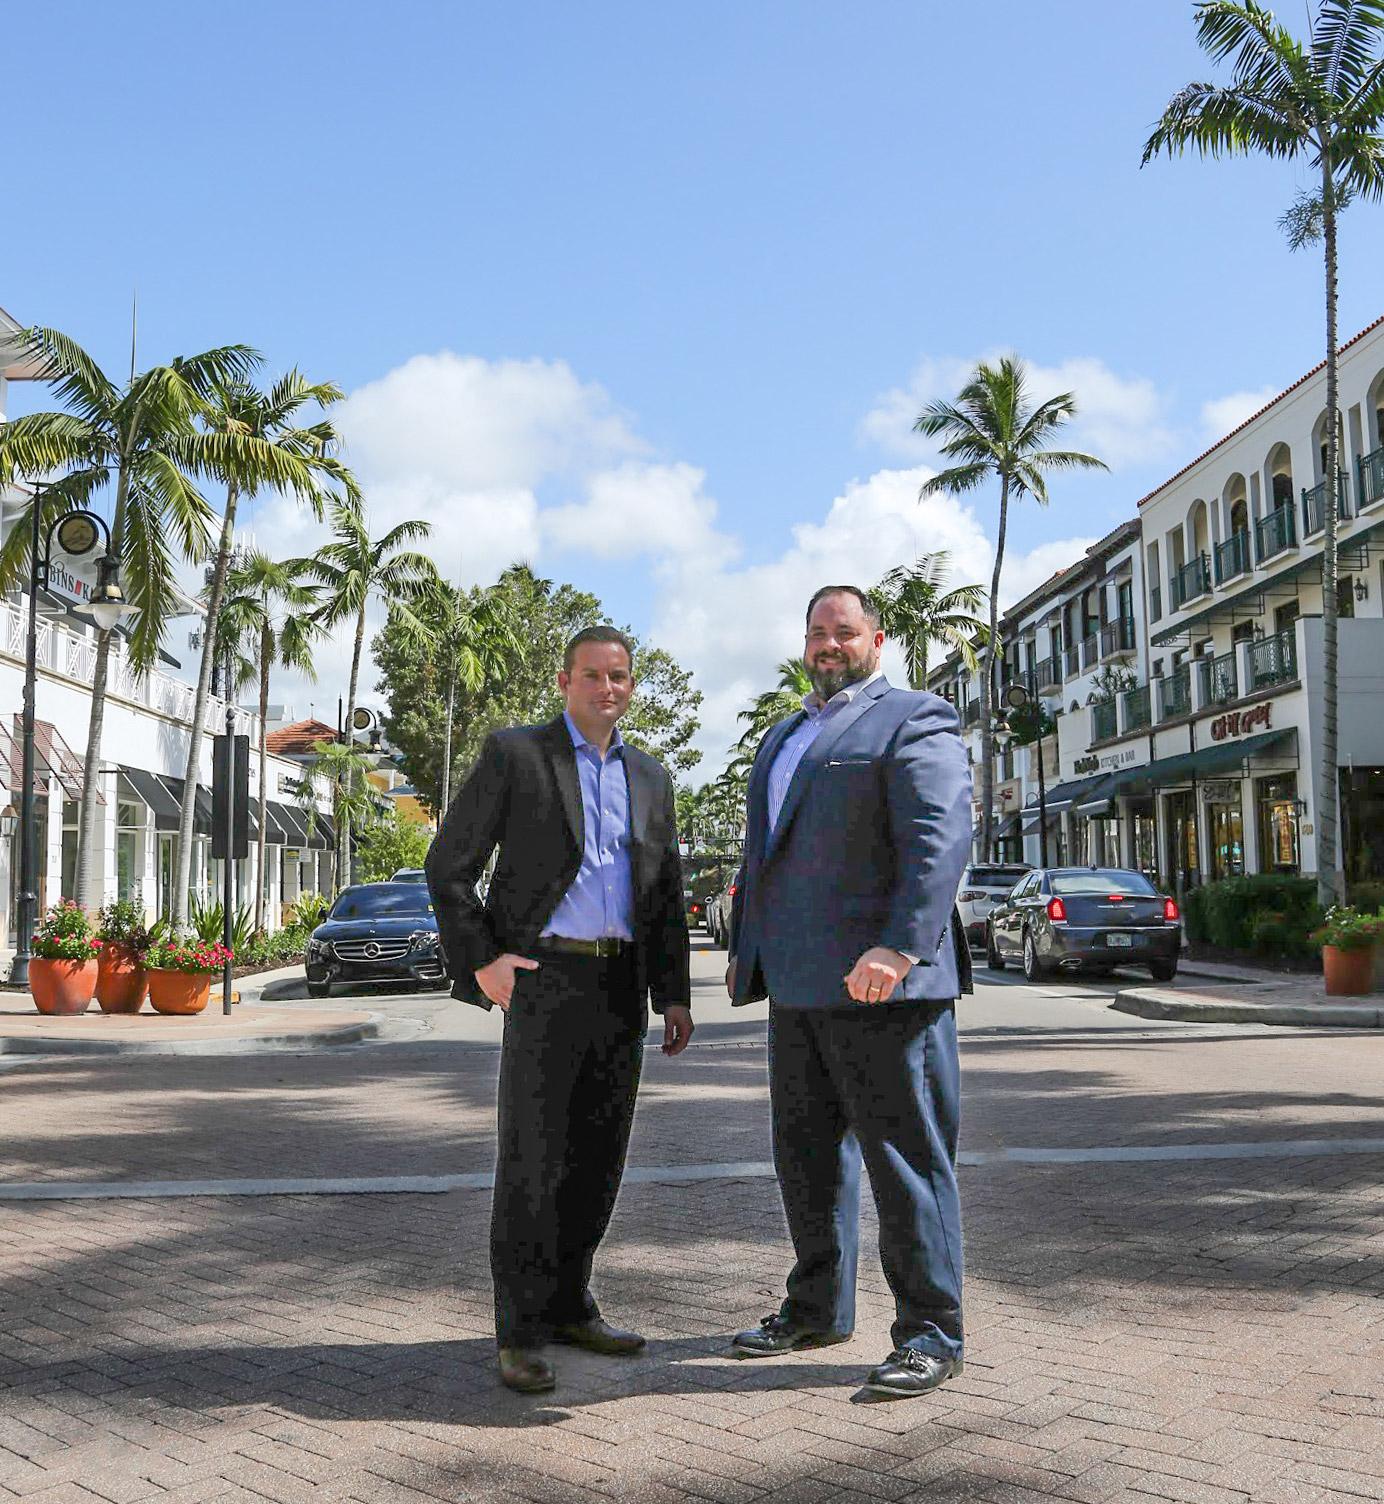 Executive Director Bruce Barone, Jr. and Board of Directors President Jeff Wynn